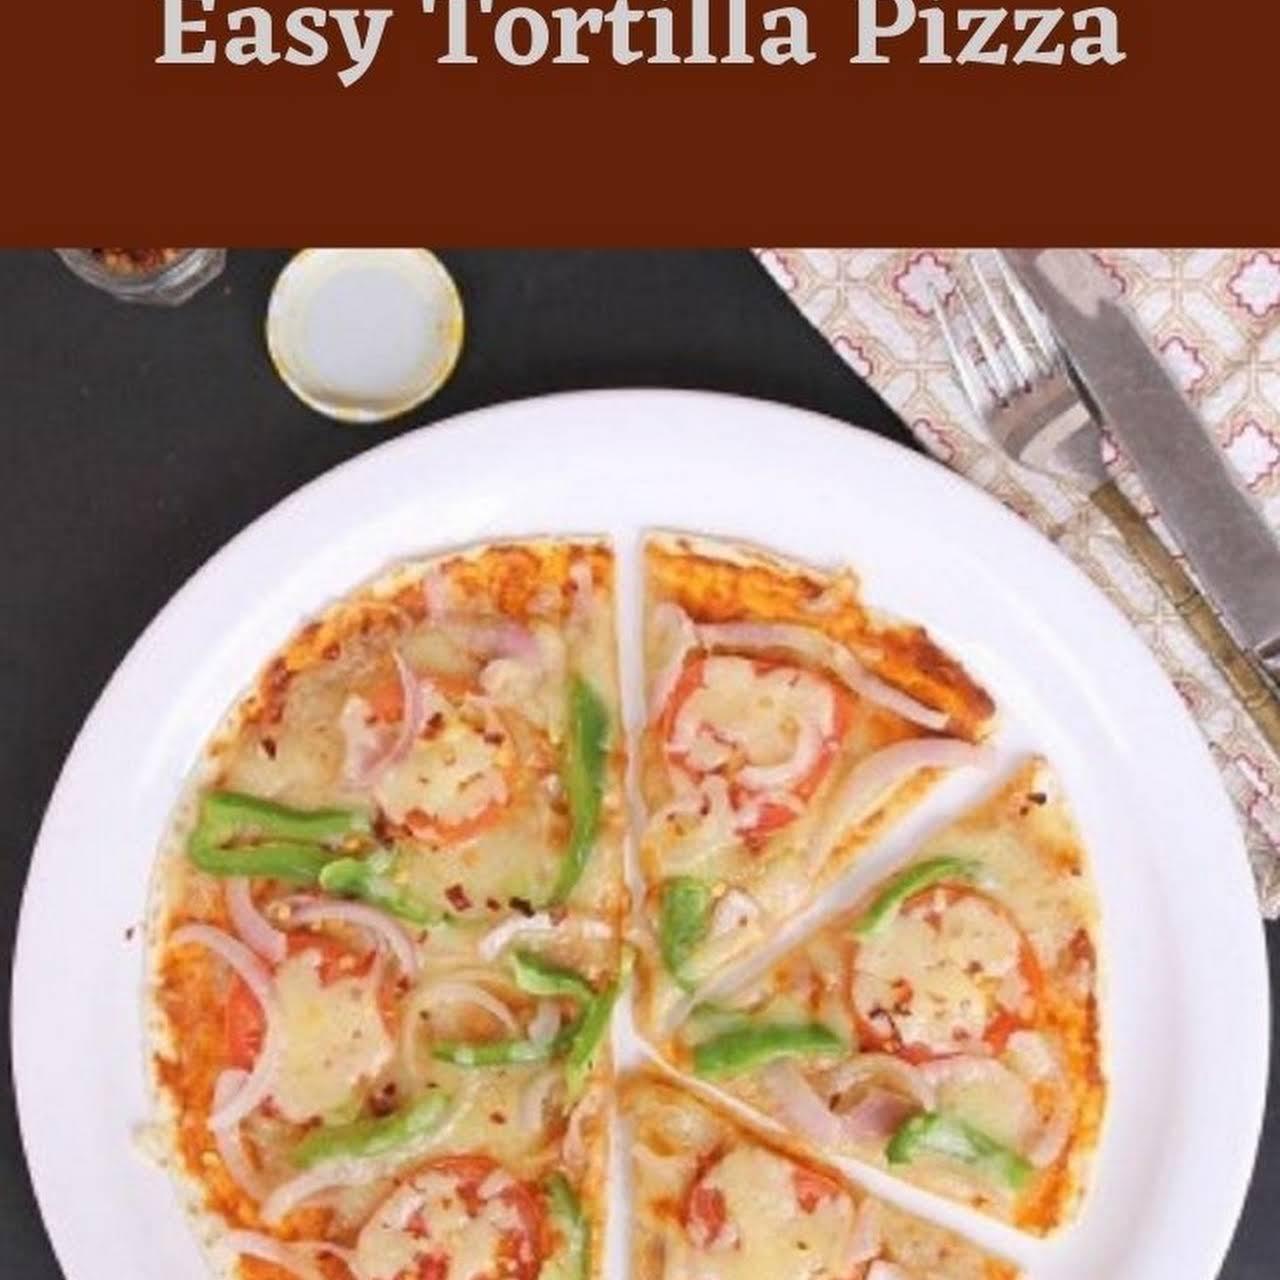 10 Best Healthy Tortilla Pizza Recipes Yummly